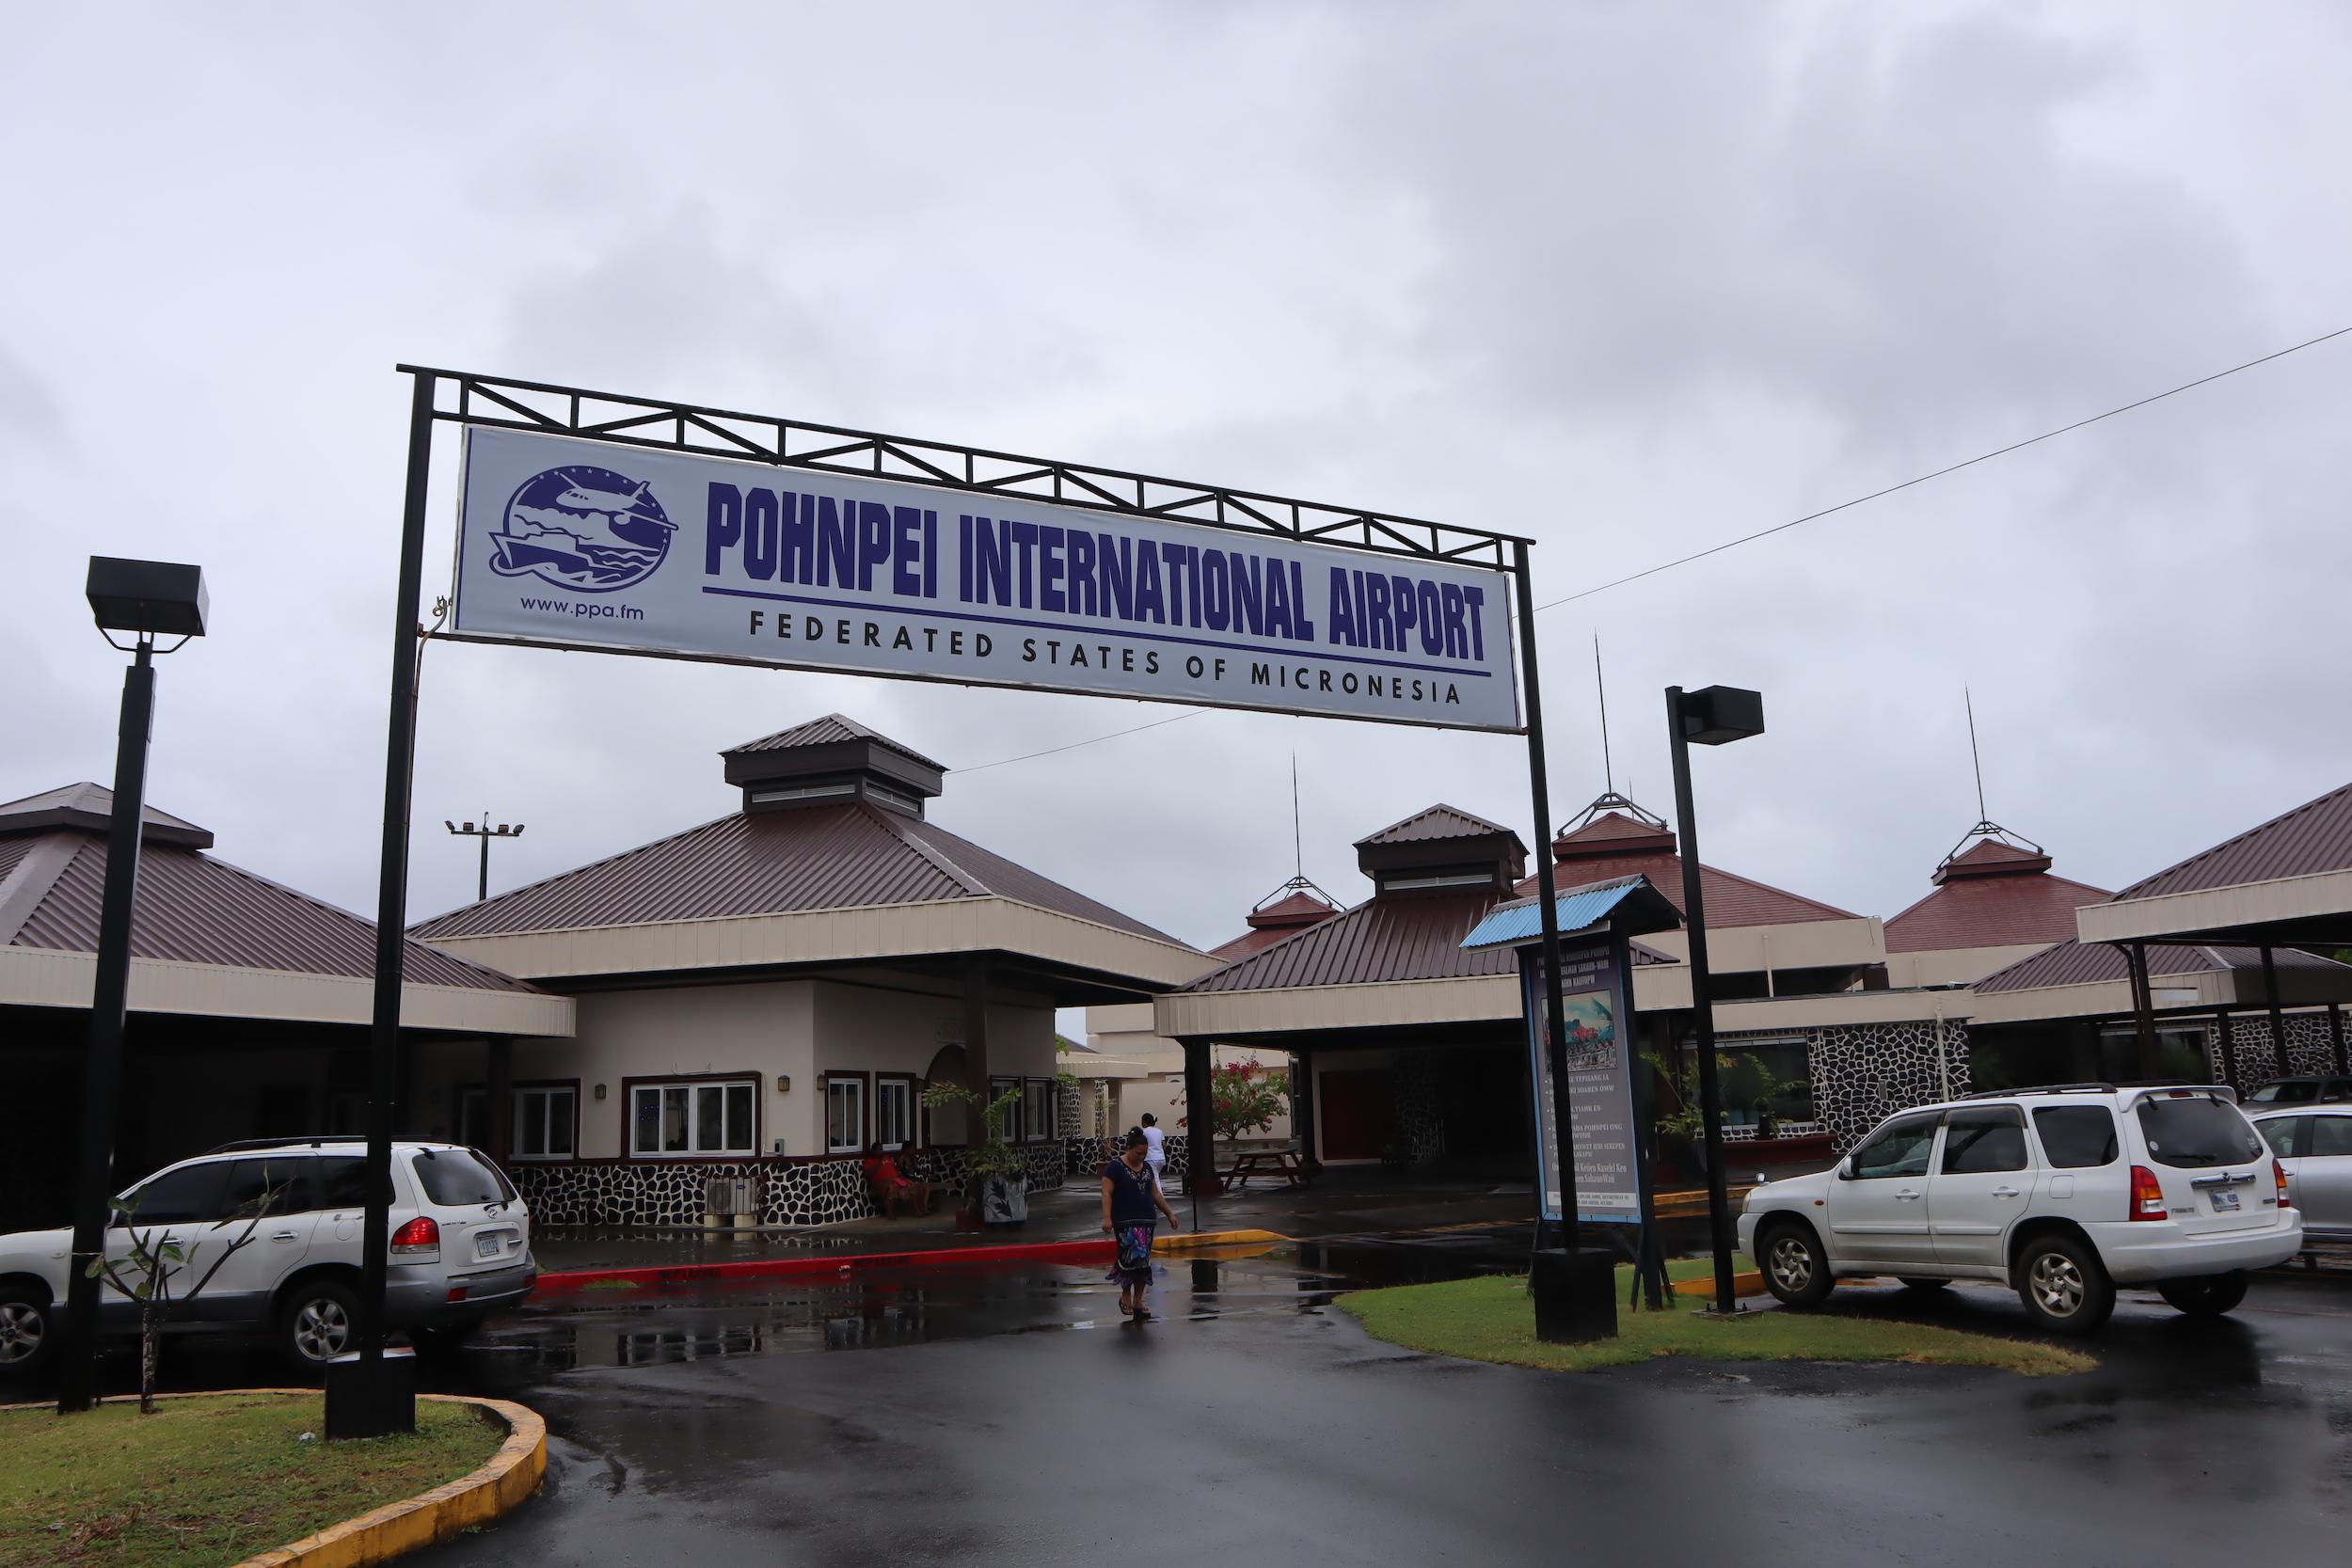 Pohnpei International Airport